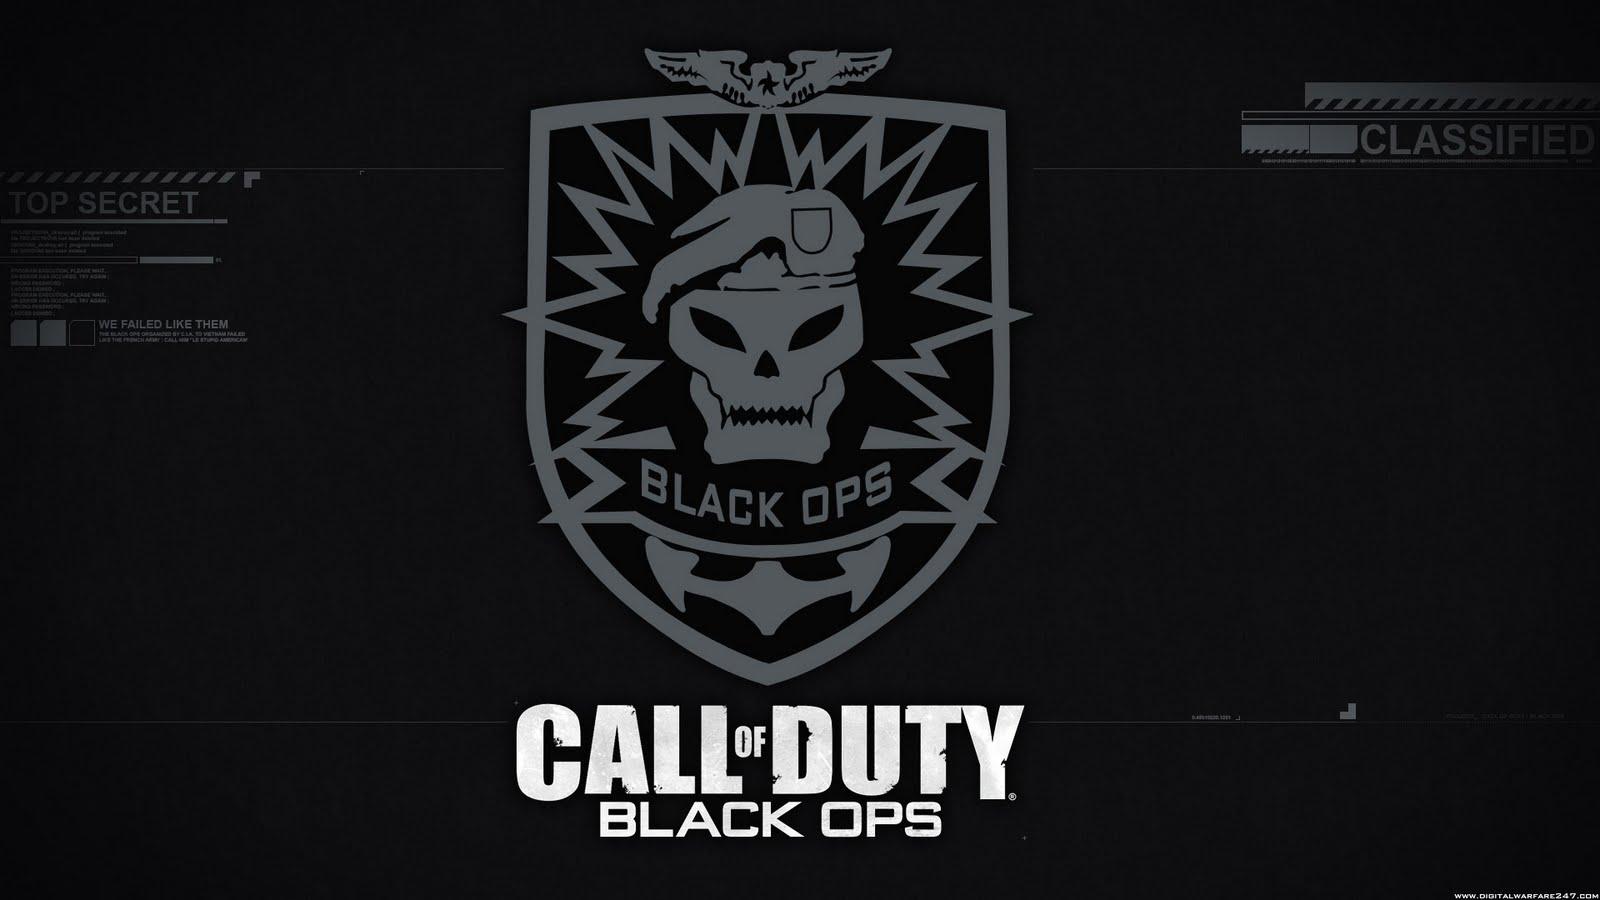 http://3.bp.blogspot.com/-30VSIizCG5g/Tc8RX40U6RI/AAAAAAAAAqM/EoLzVEAY6ss/s1600/black+ops+zombie+call+of+duty+cod+wallpaper.jpg